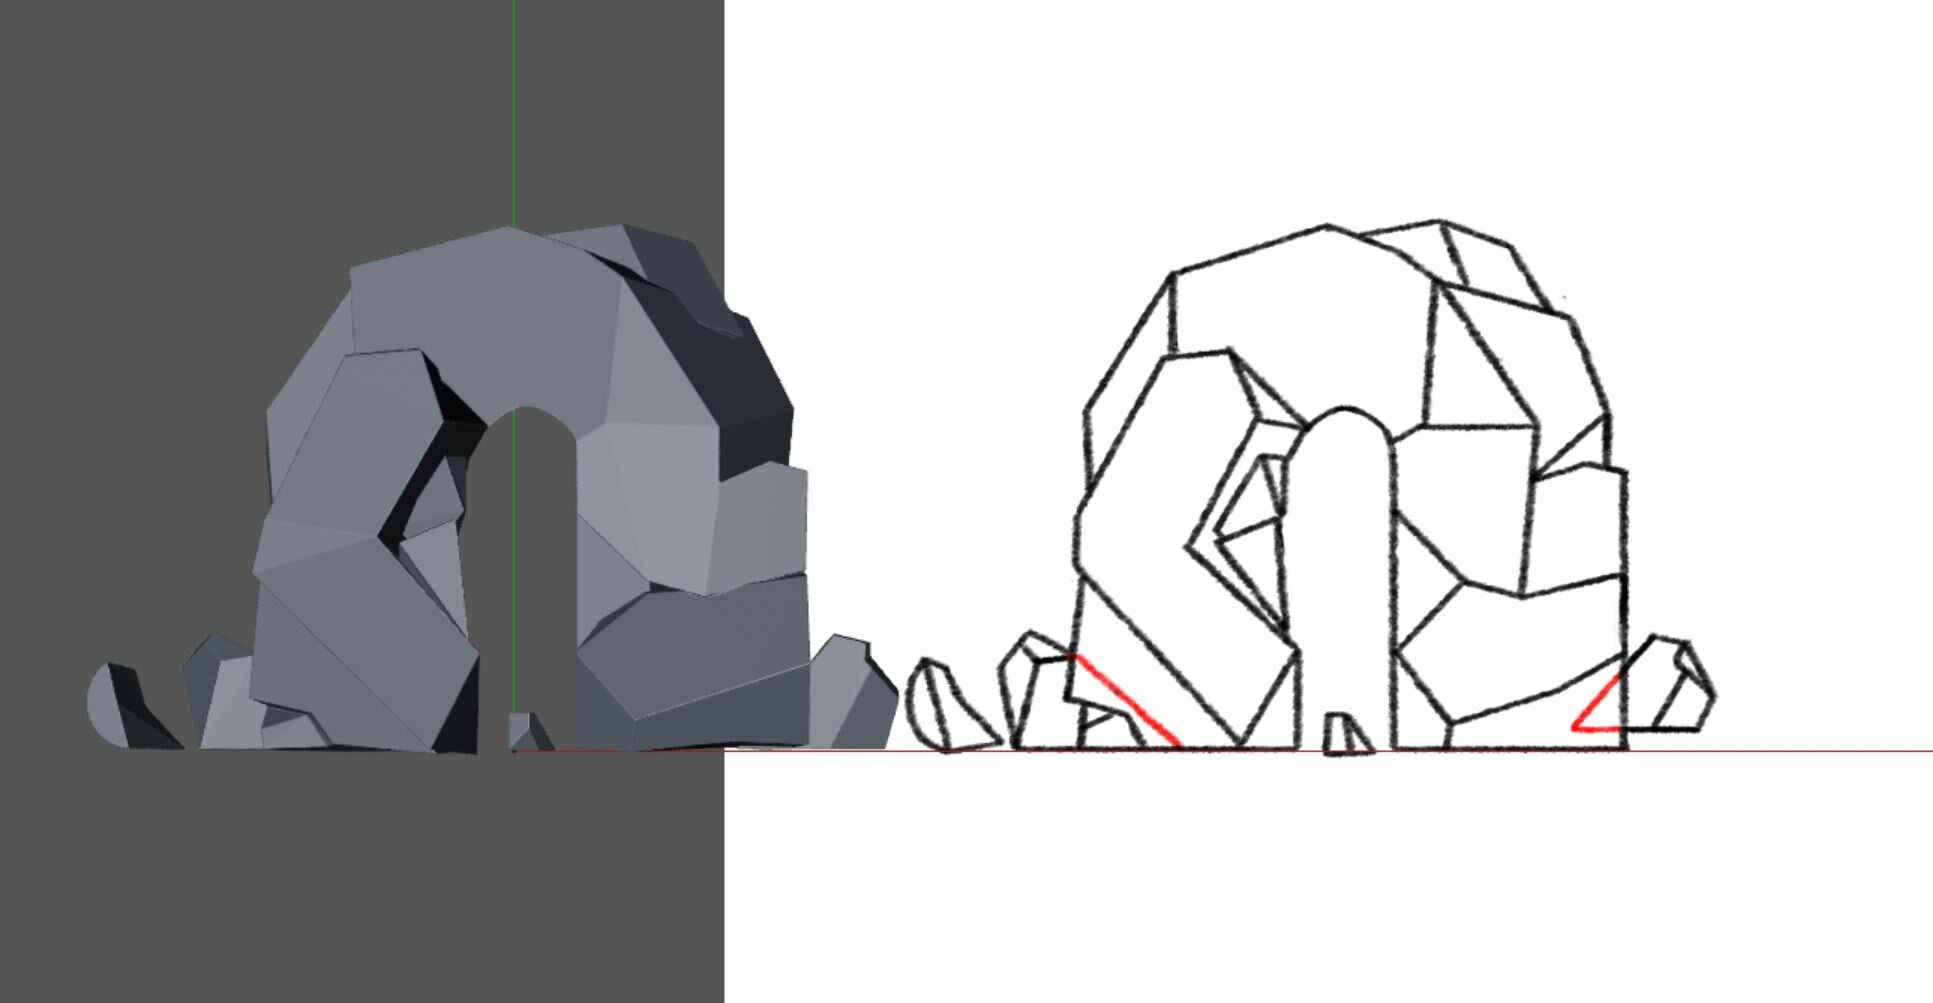 Cut character designs I modeled